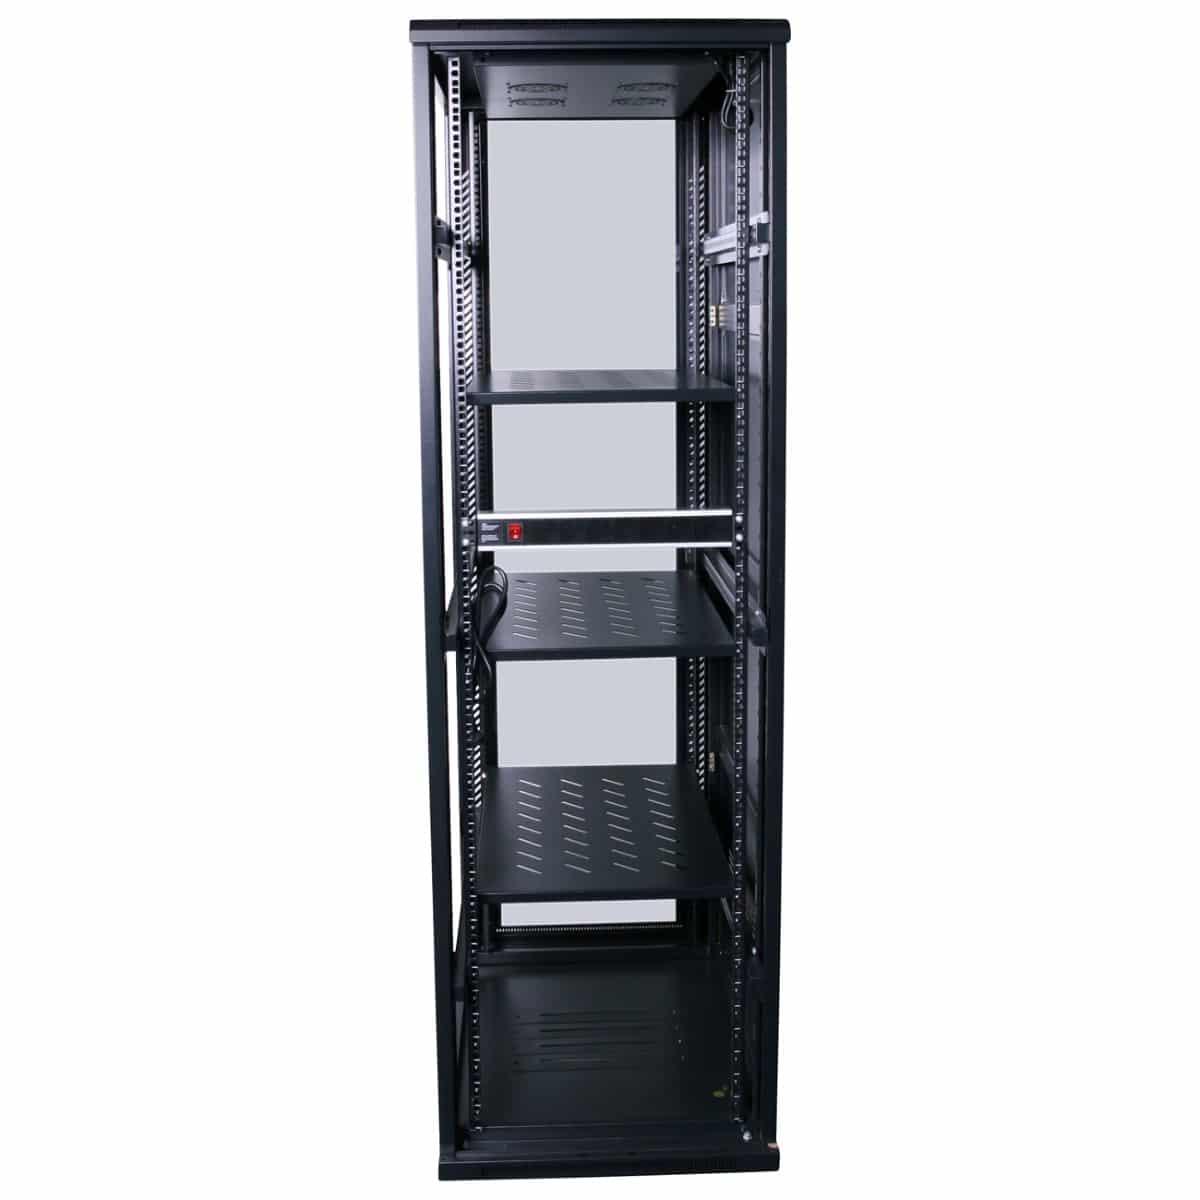 42ru 1000mm Deep X 600mm Wide Rack Cabinet Hcc